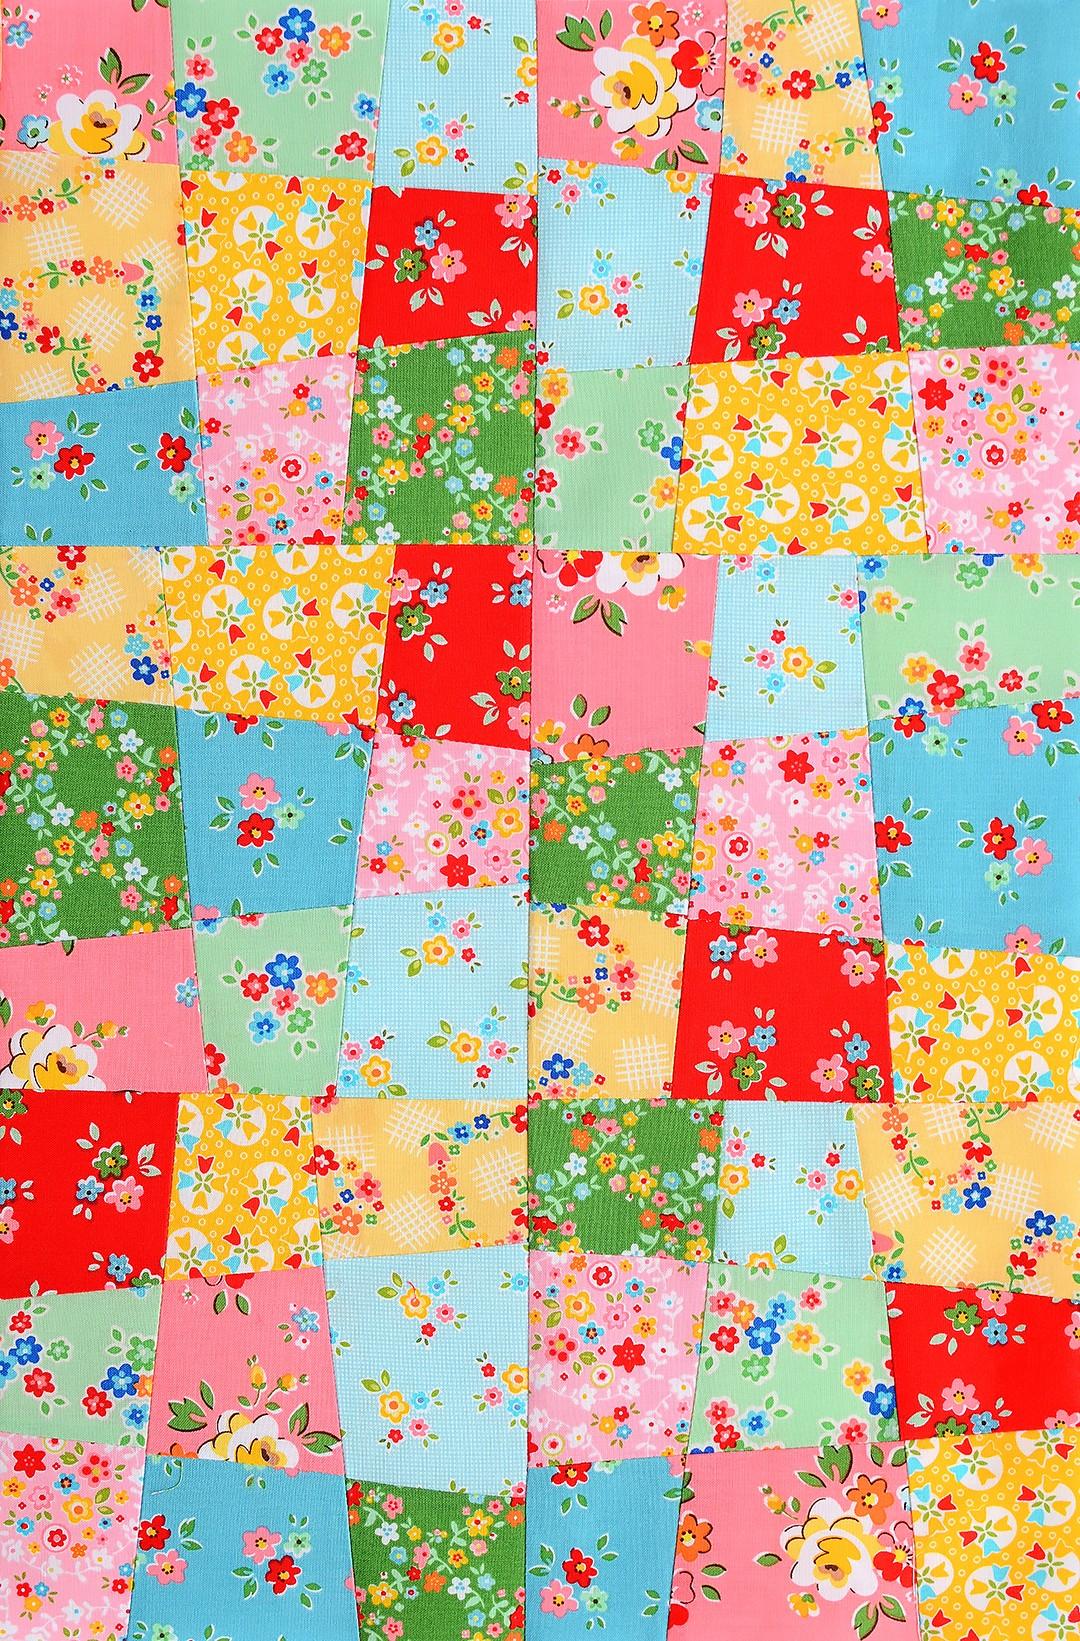 Crazy Nine Patch Quilt Block - Patchworken fuer Anfaenger